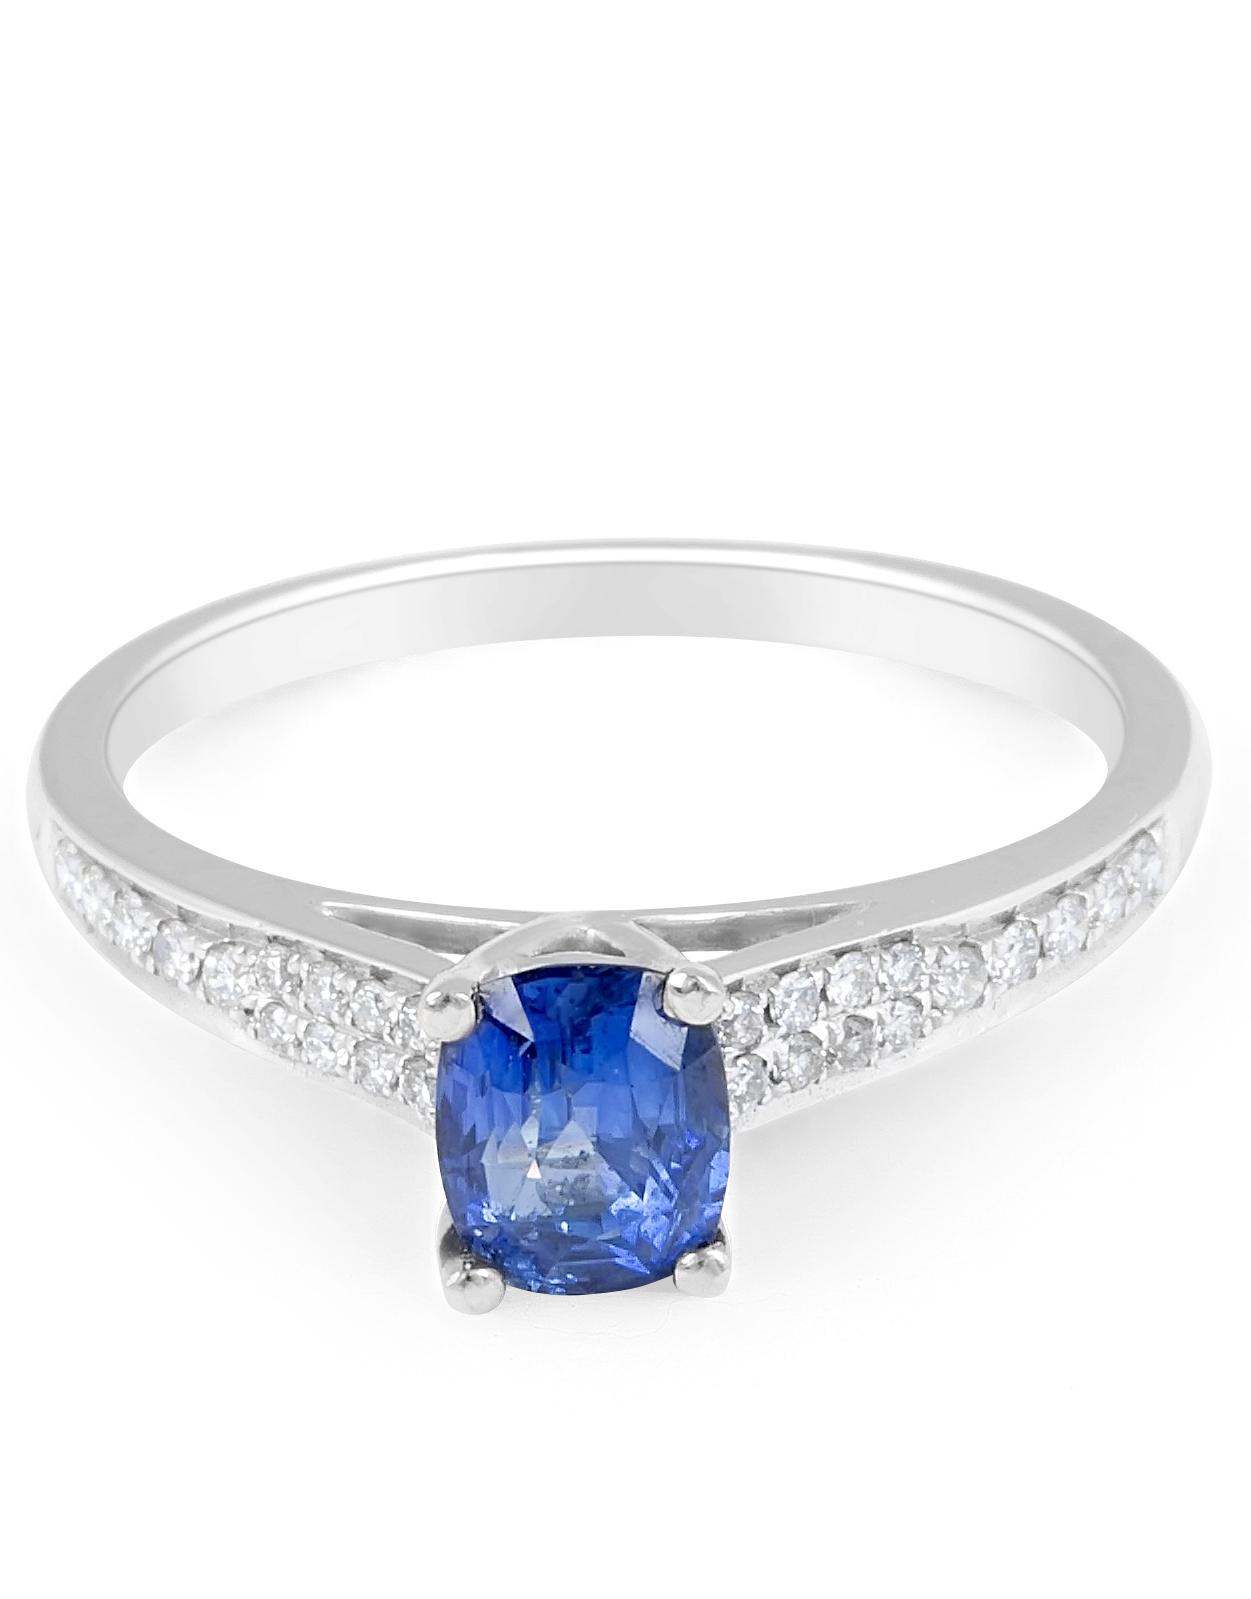 Blue Sapphire Diamond Engagement Ring in 18 Karat White Gold